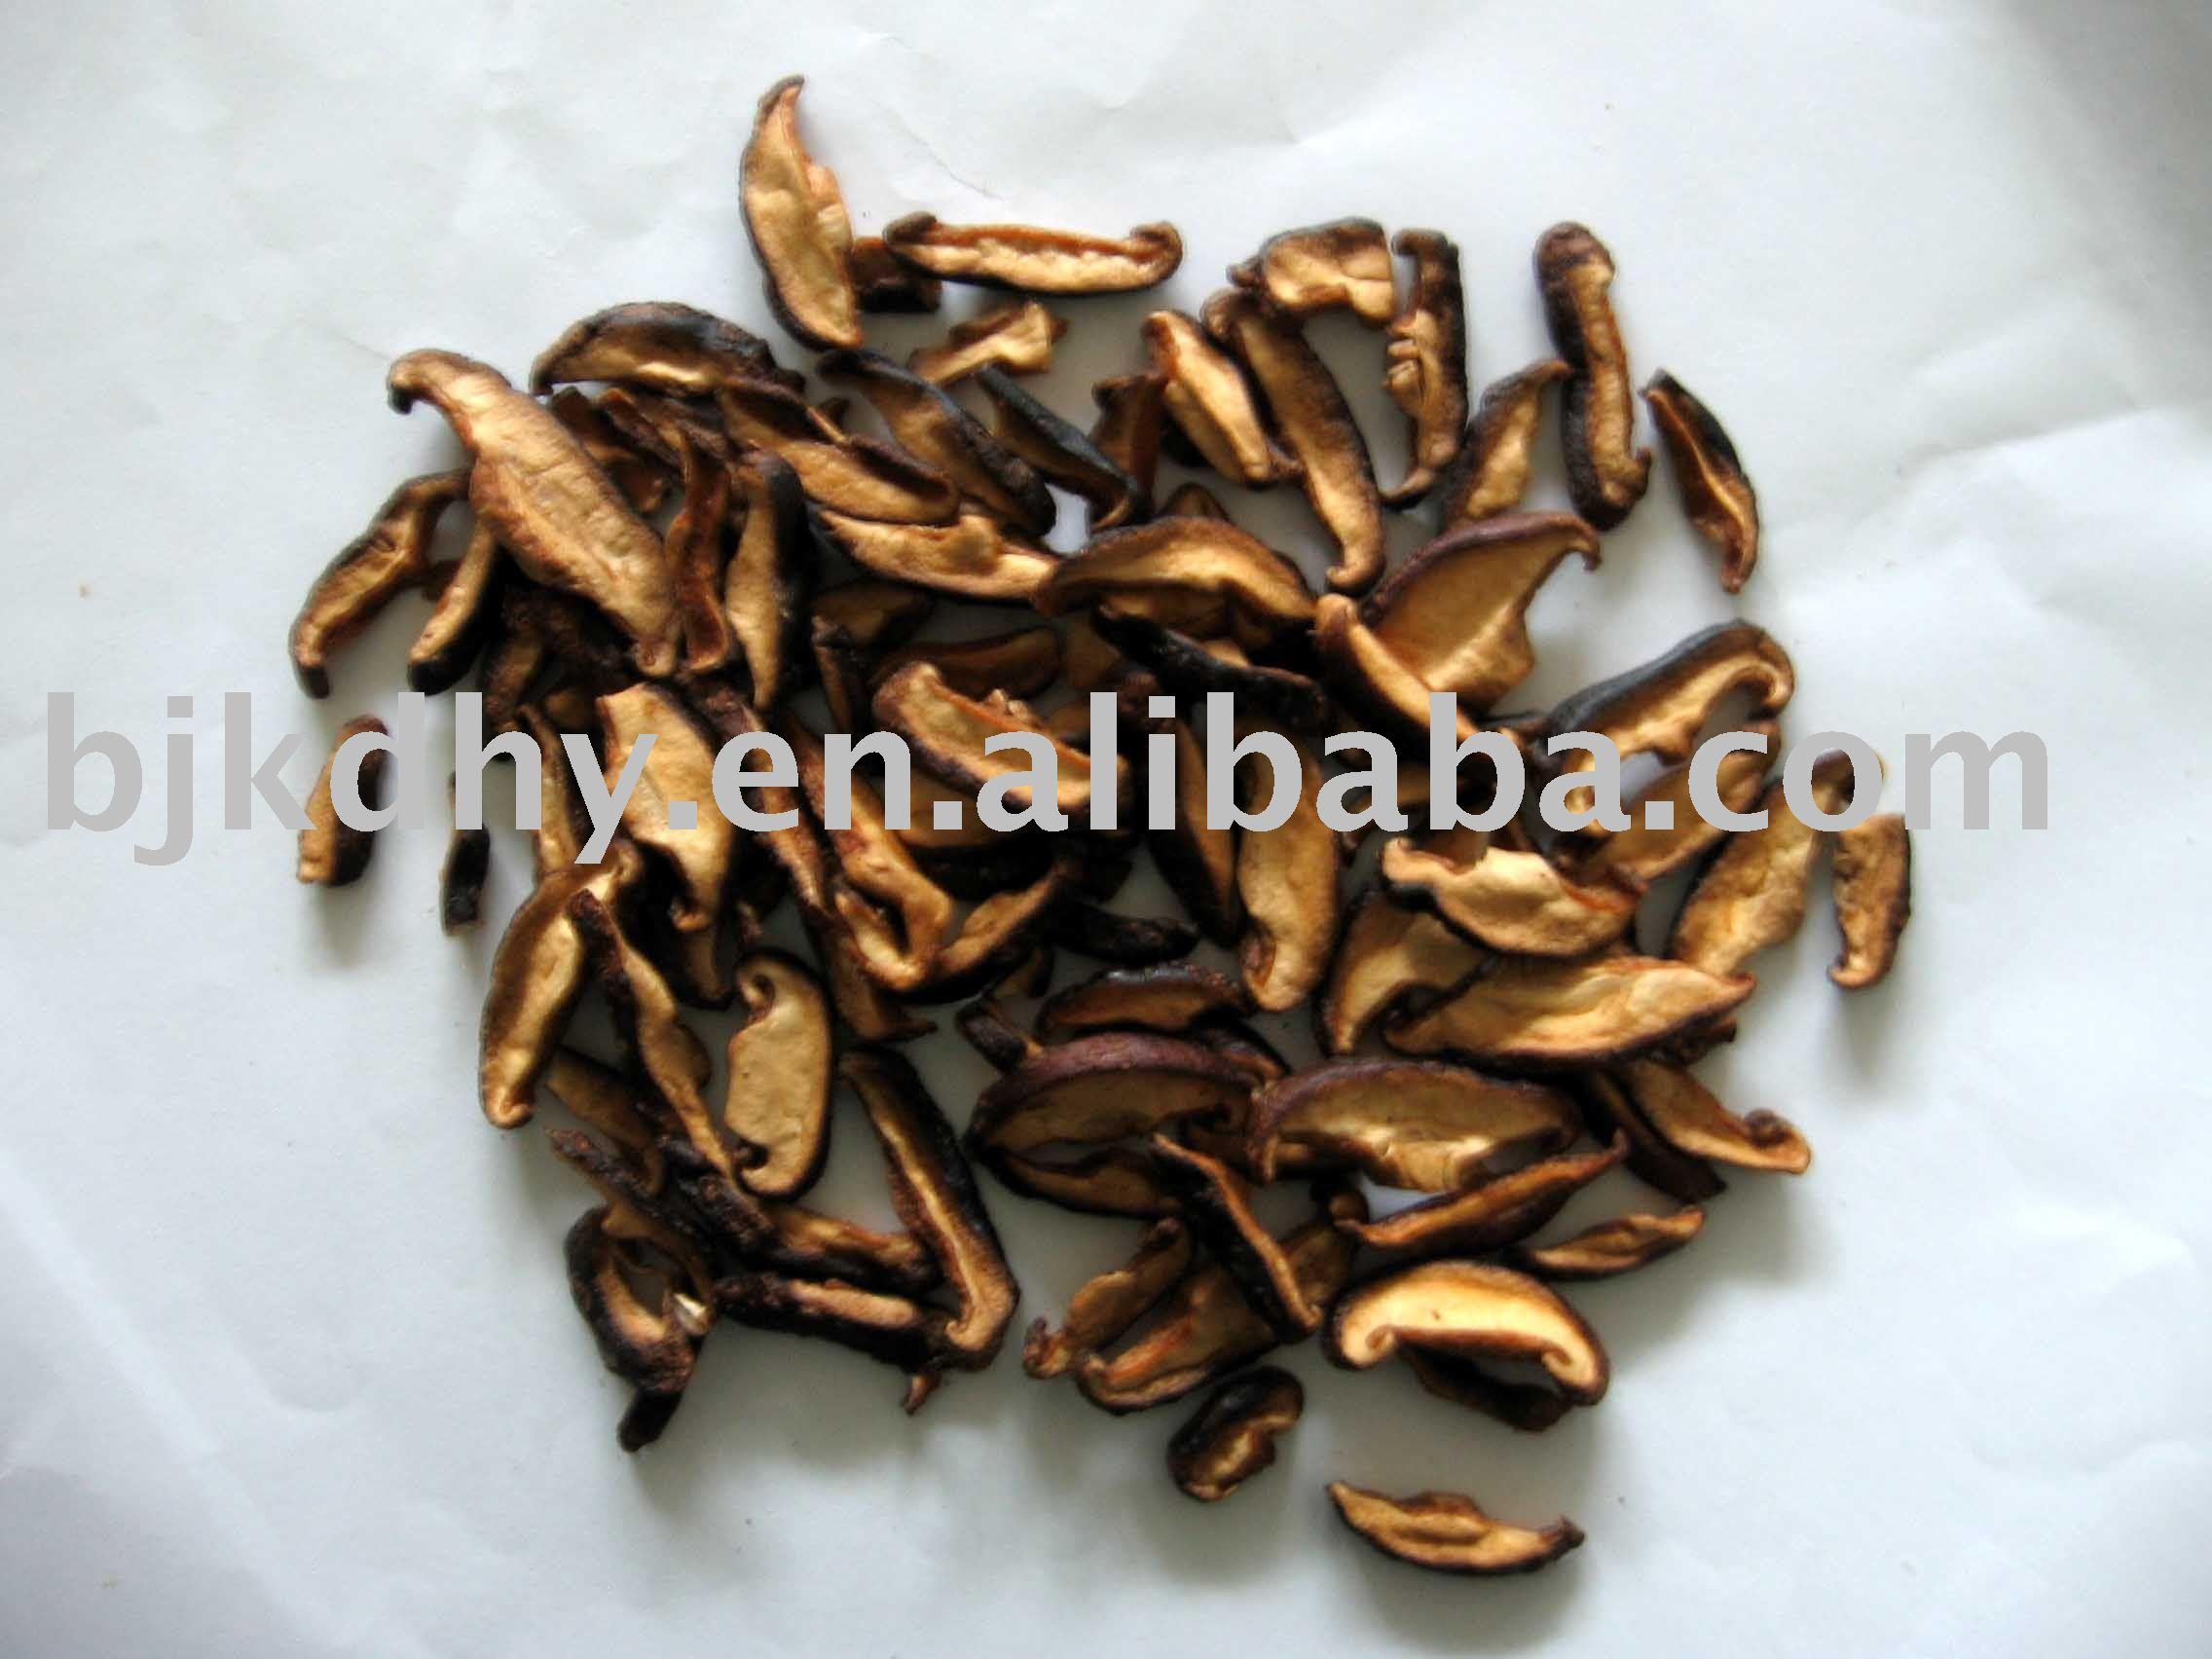 low temperature vacuum fried  mushroom chips